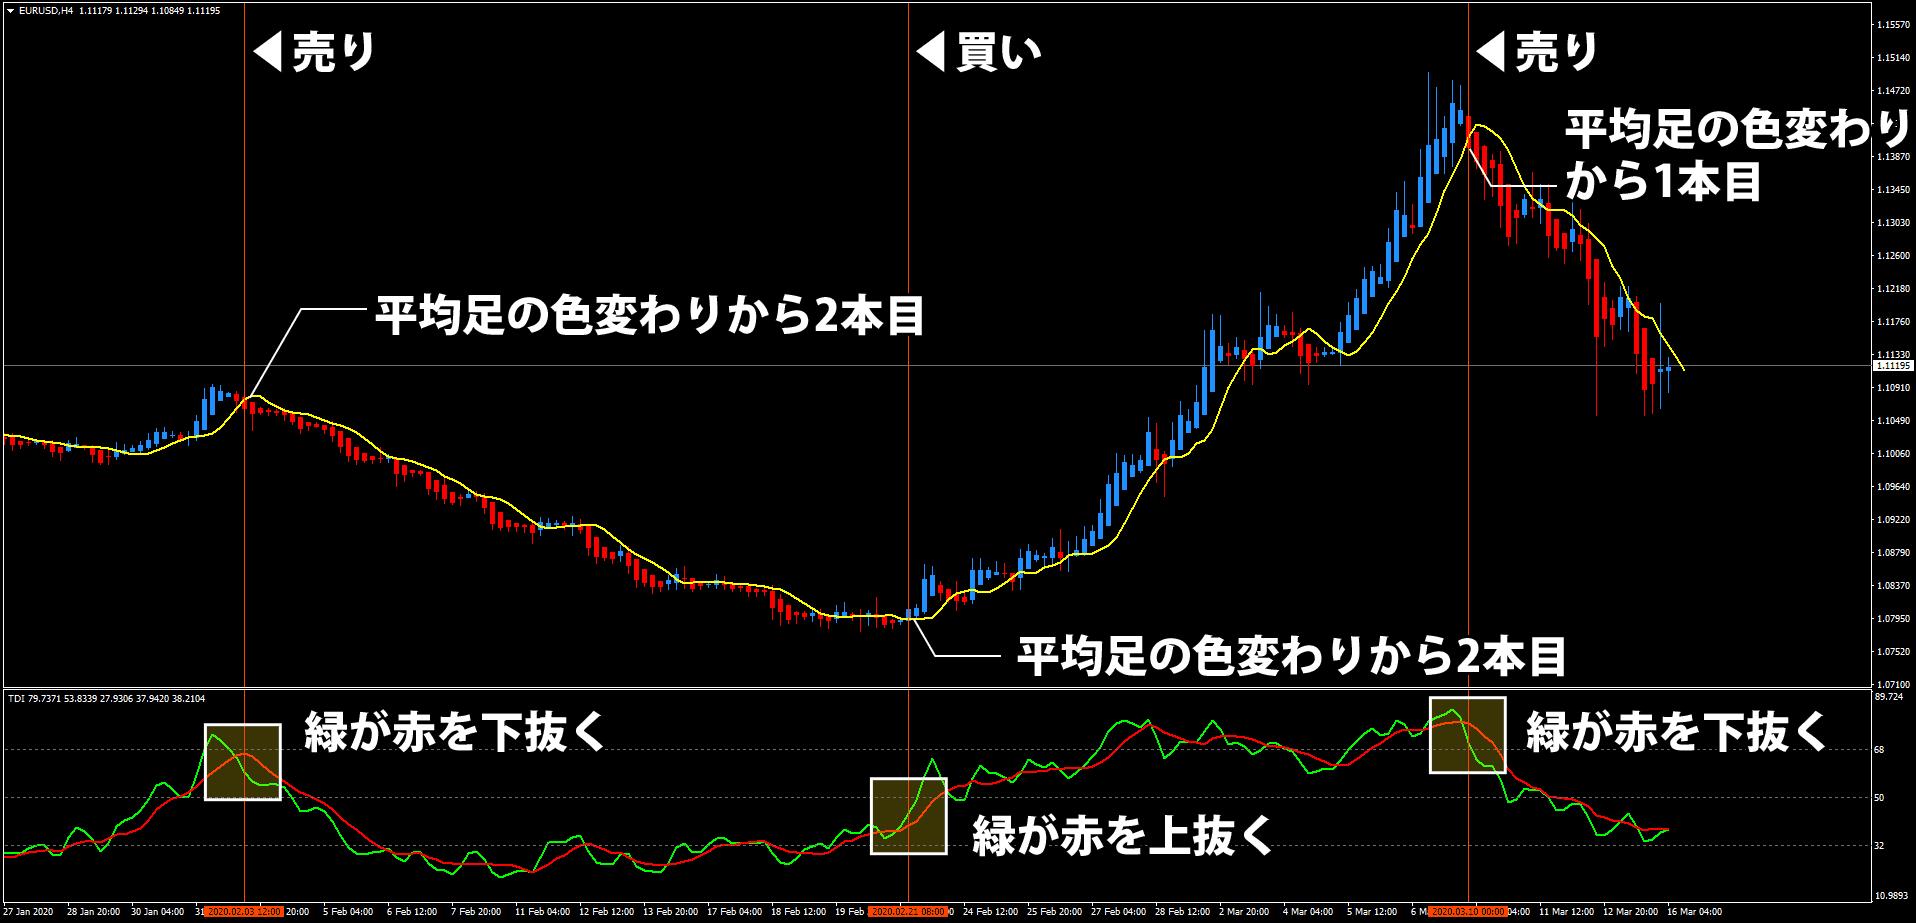 Trading Made Simpleのエントリー条件